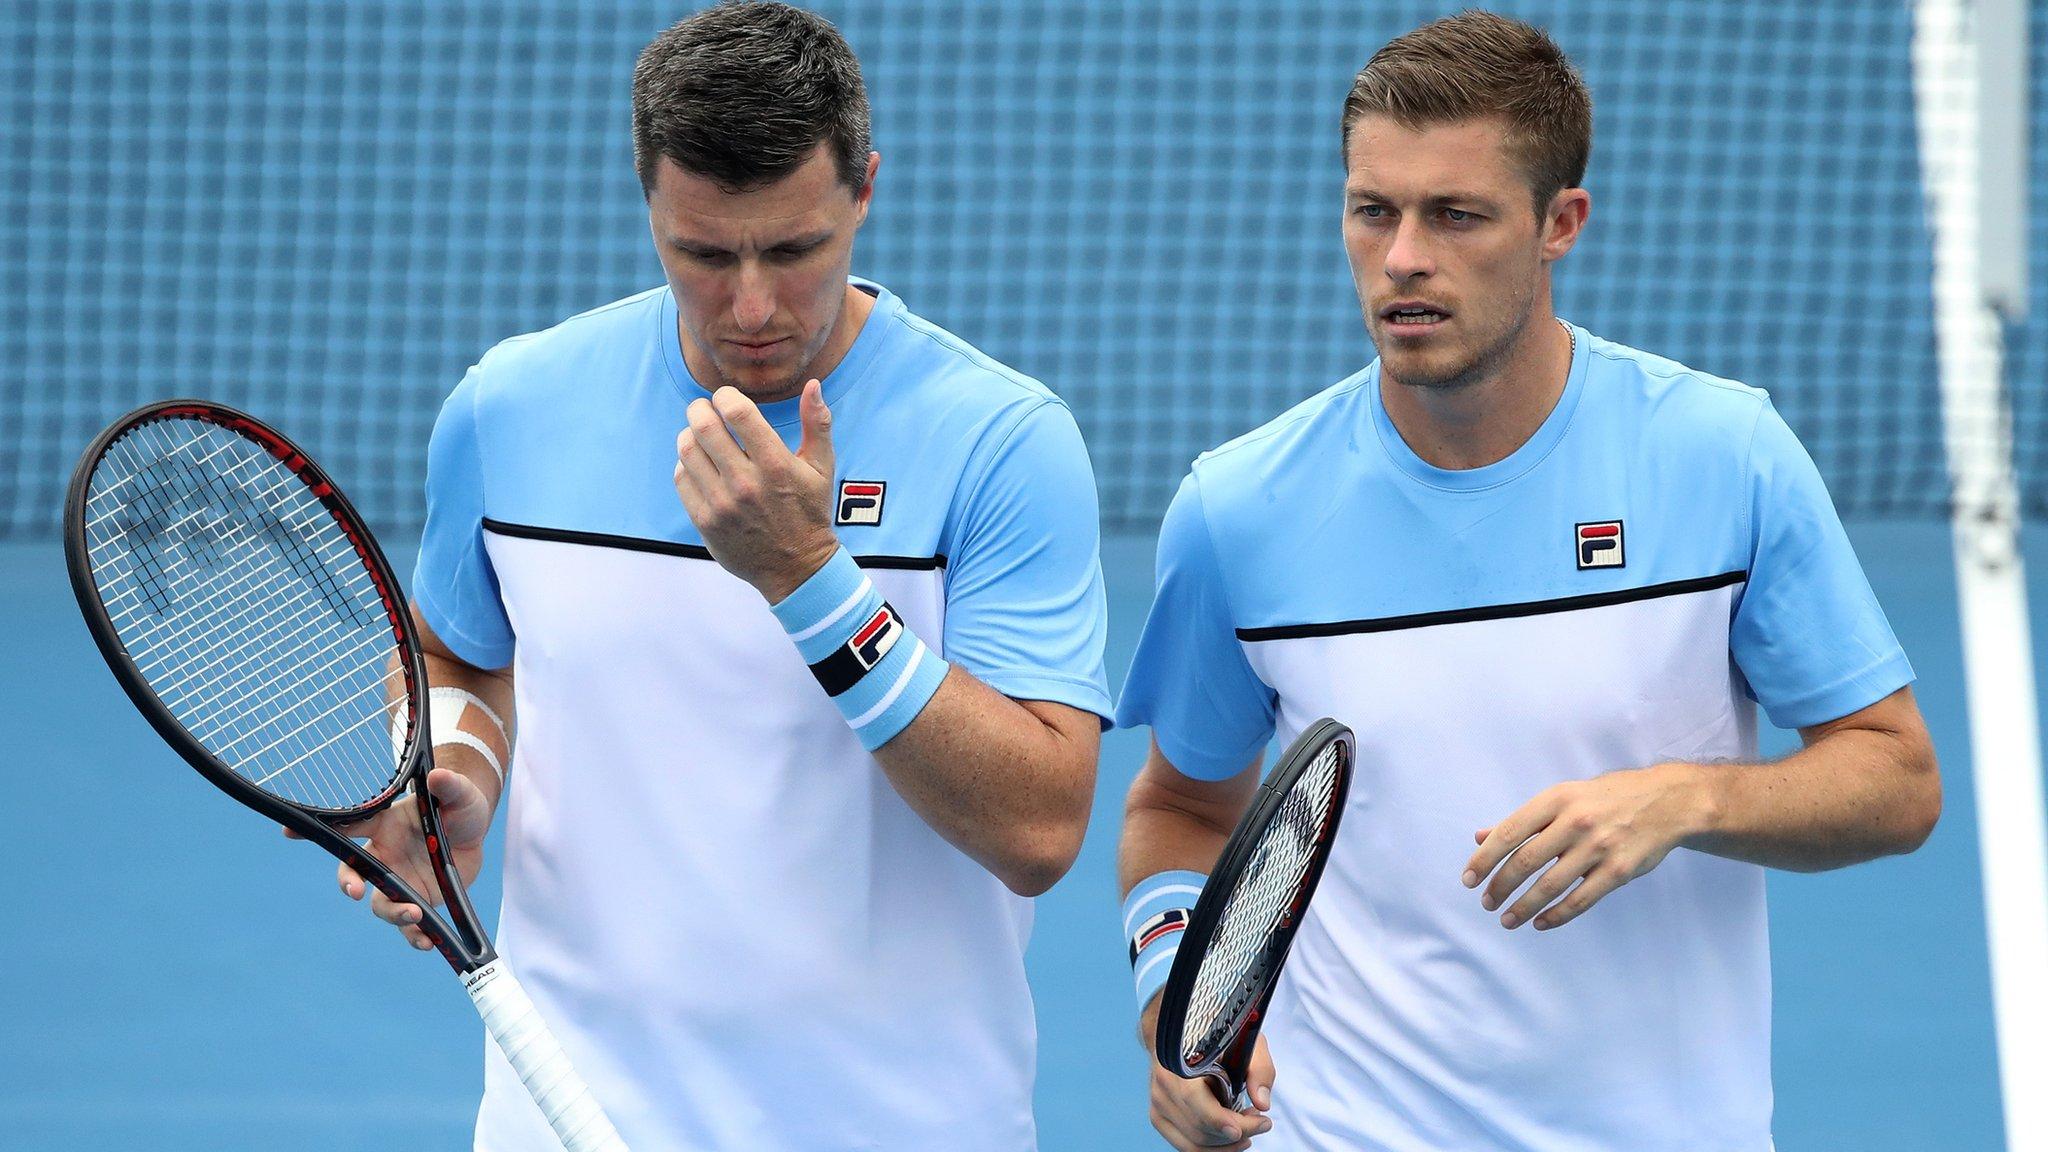 Australian Open 2019: Britain's Neal & Ken Skupski and Harriet Dart lose doubles